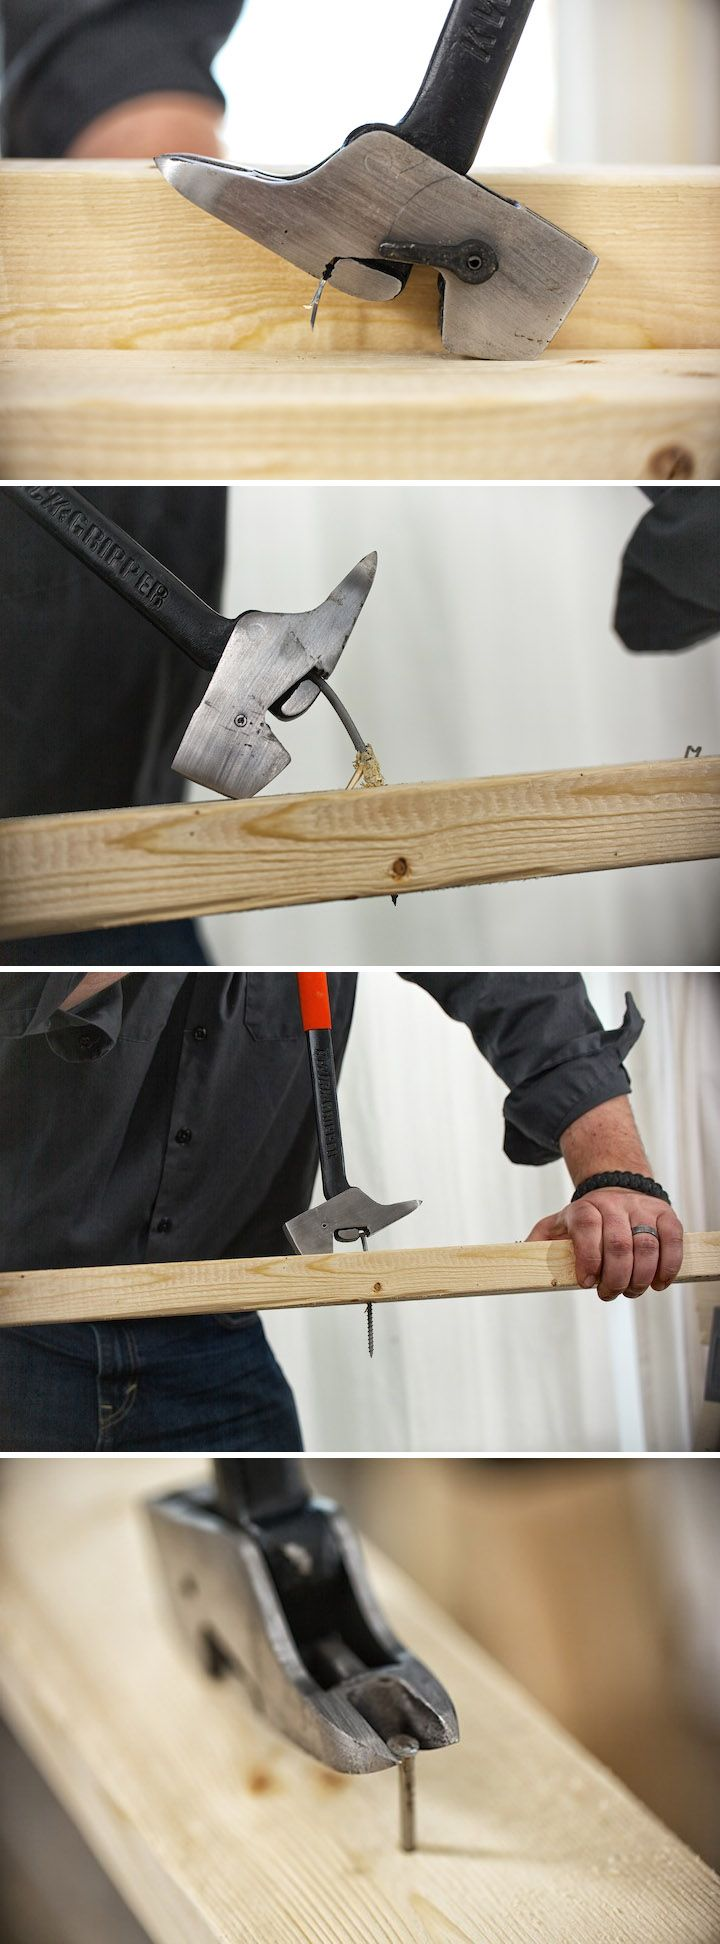 EB Tool Comapny - Nail Remover